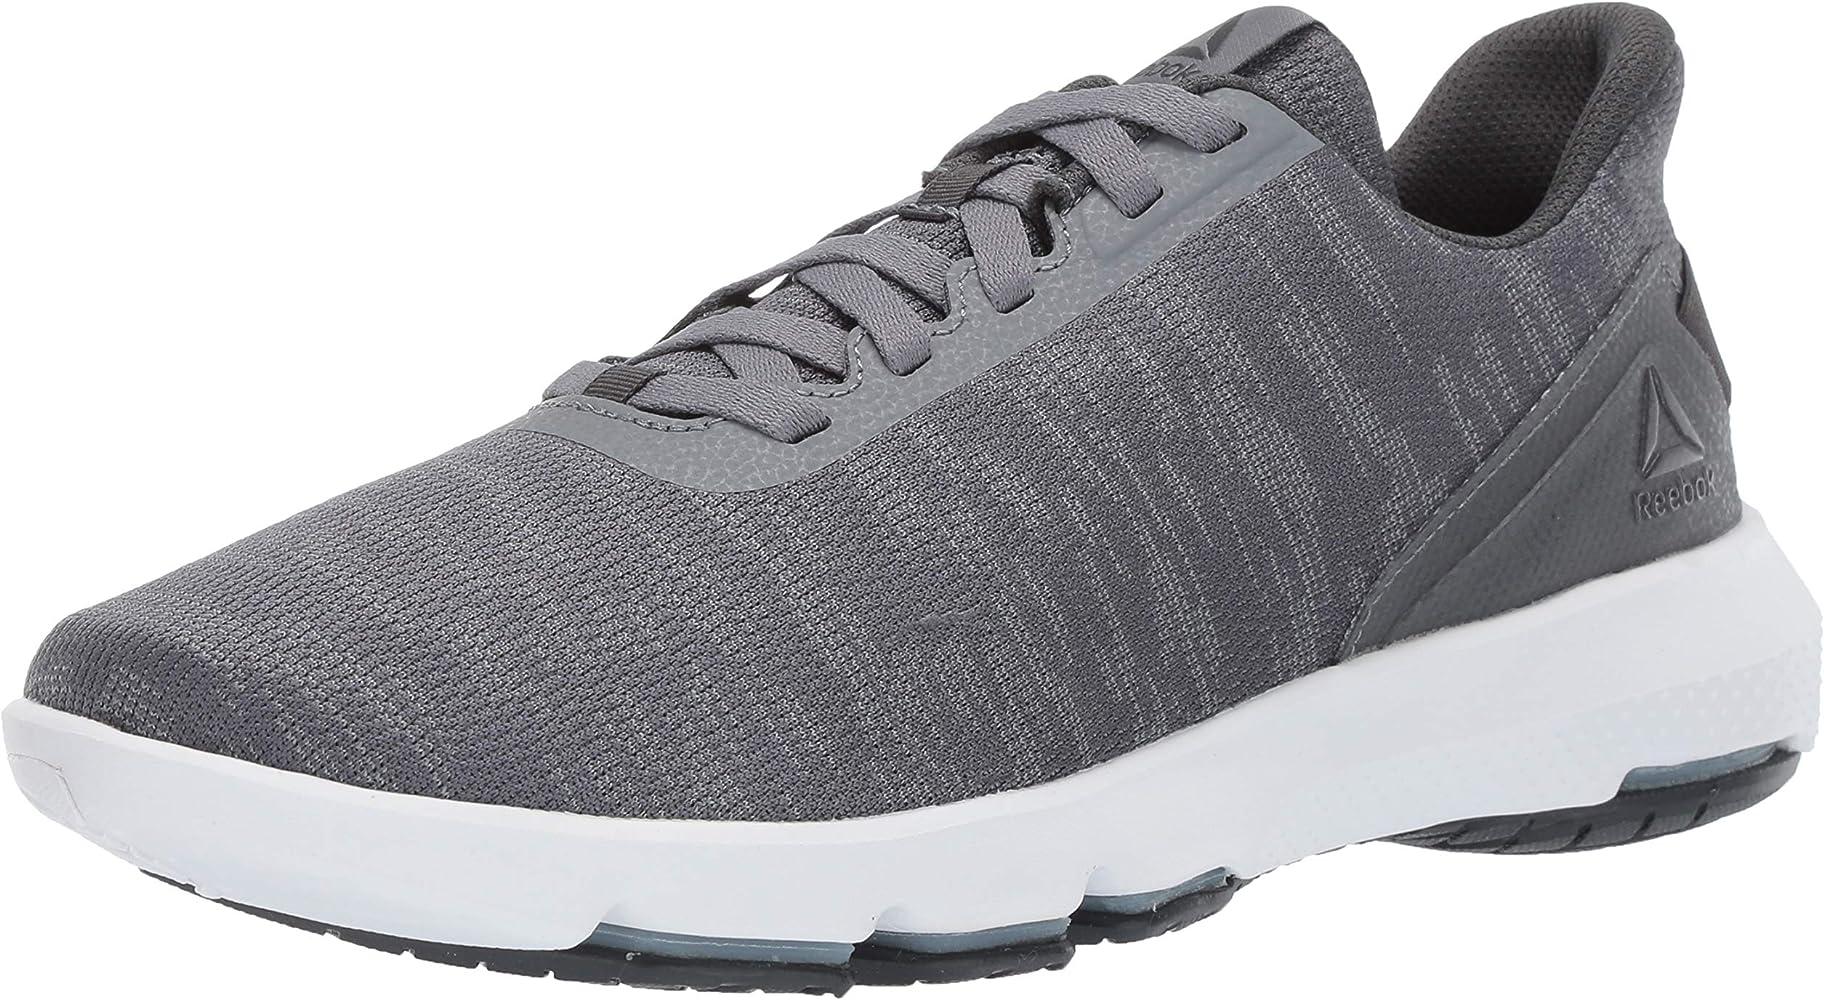 Cloudride DMX 4.0 Walking Shoe